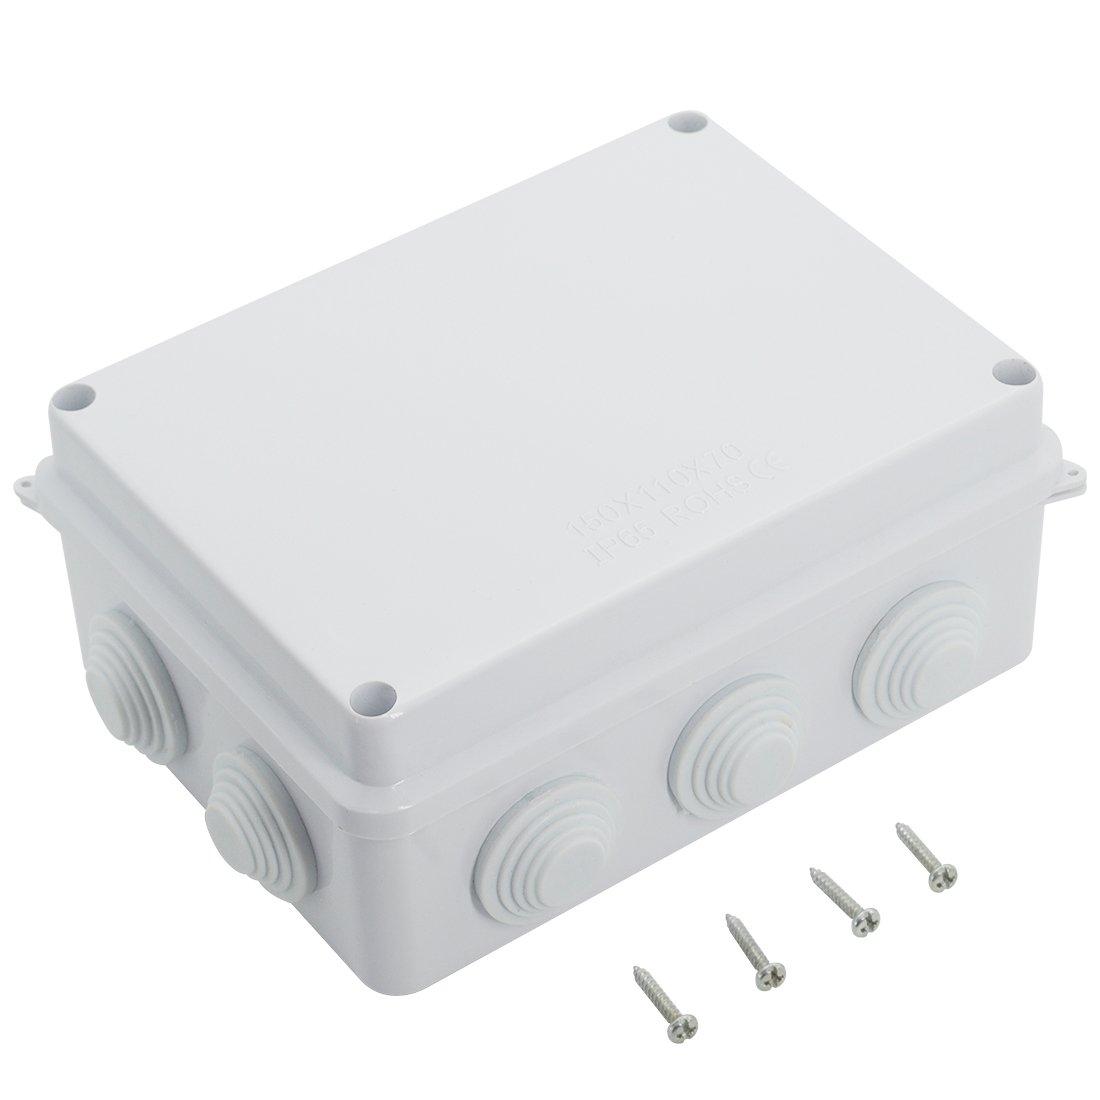 "LeMotech ABS Plastic Dustproof Waterproof IP65 Junction Box Universal Electrical Project Enclosure White 5.9"" x 4.3"" x 2.8""(150mmx110mmx70mm)"